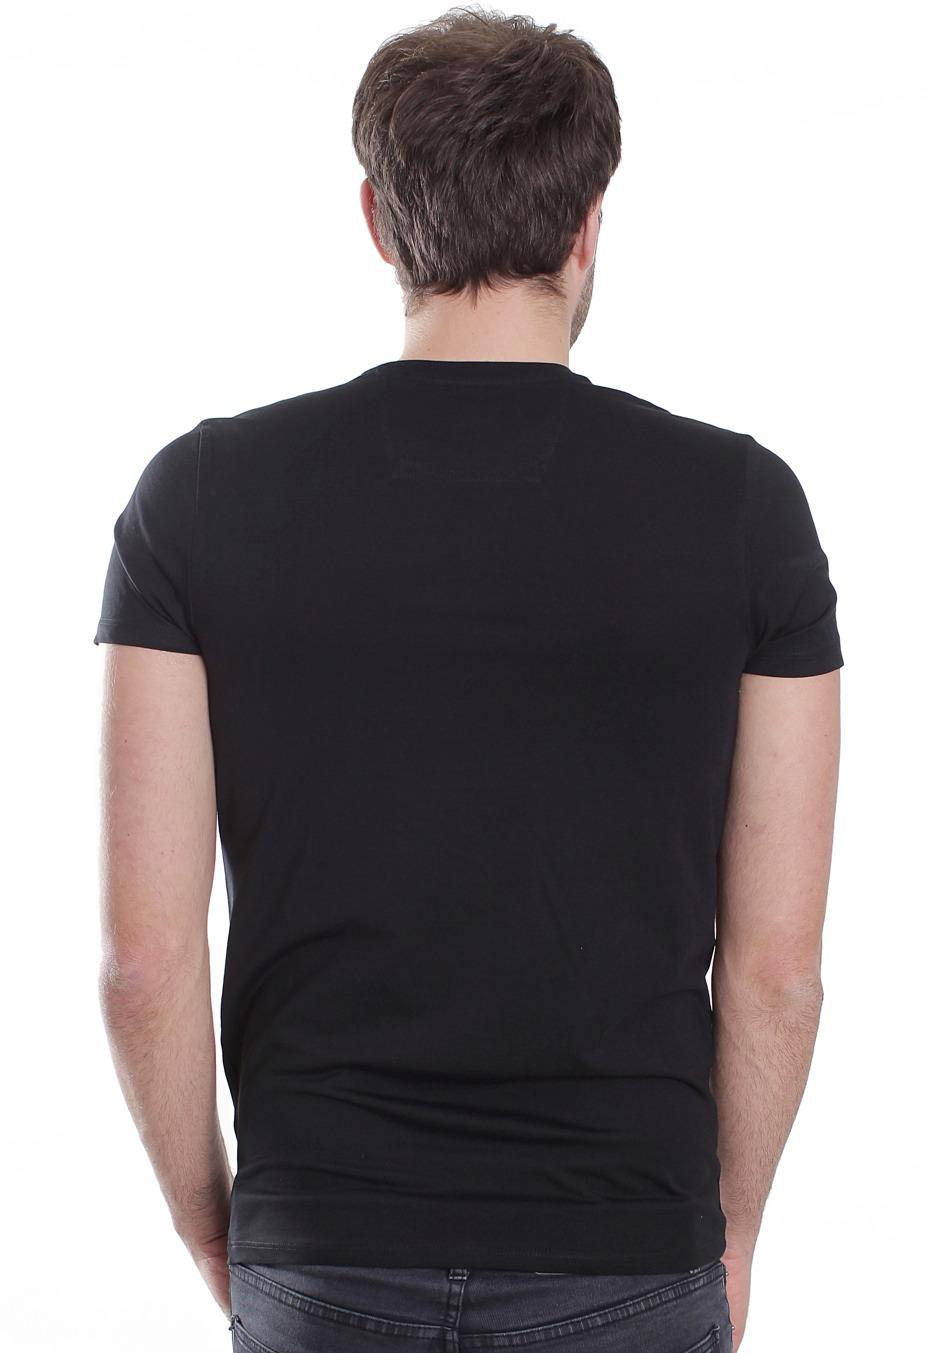 Shirt T Mod Boutique Sherman Mb00022s Fit Ben Throne xganwq